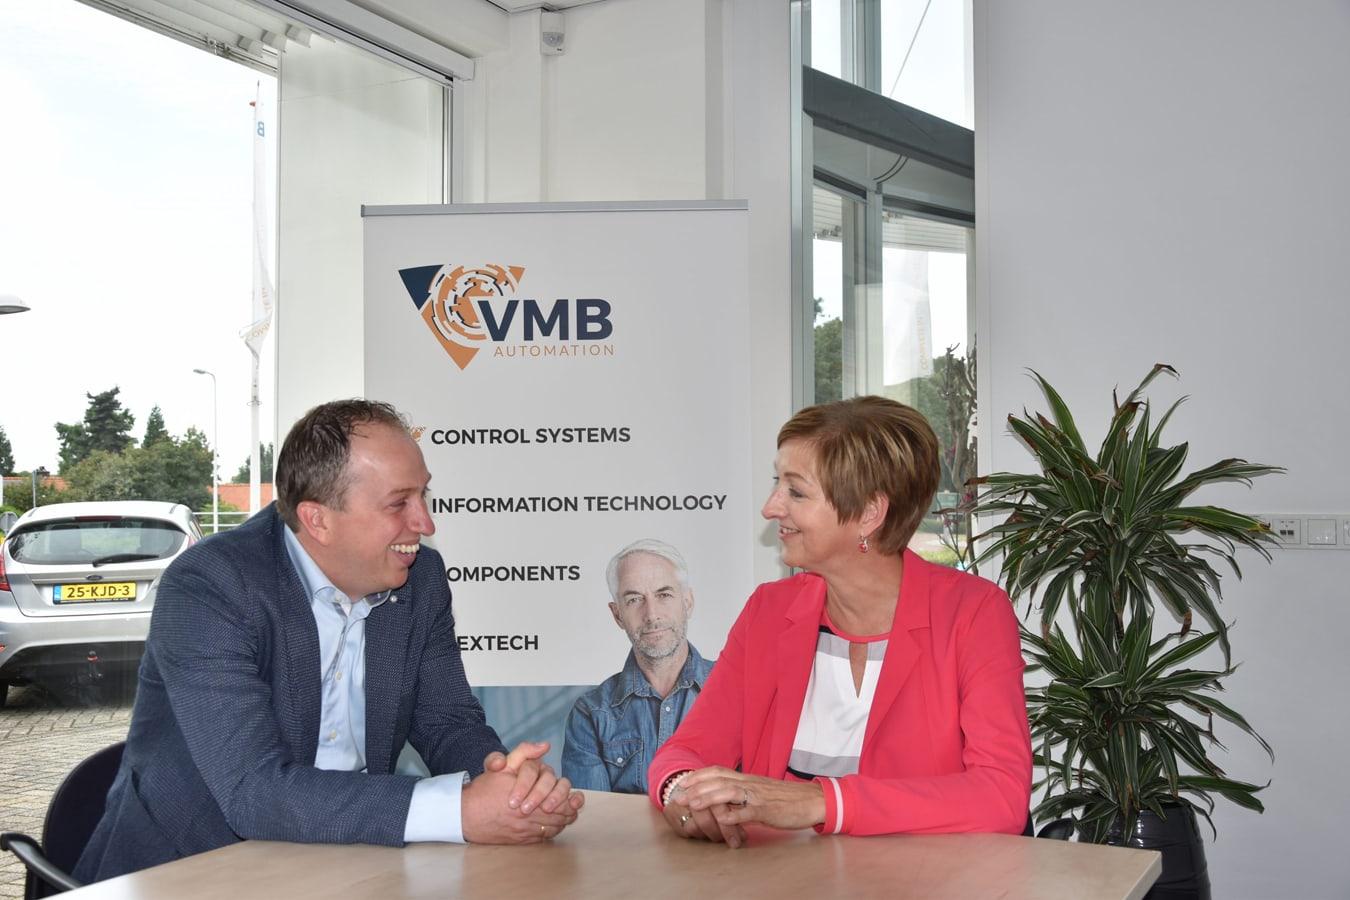 Klantverhaal Loket.nl - Fidor - VMB Automation